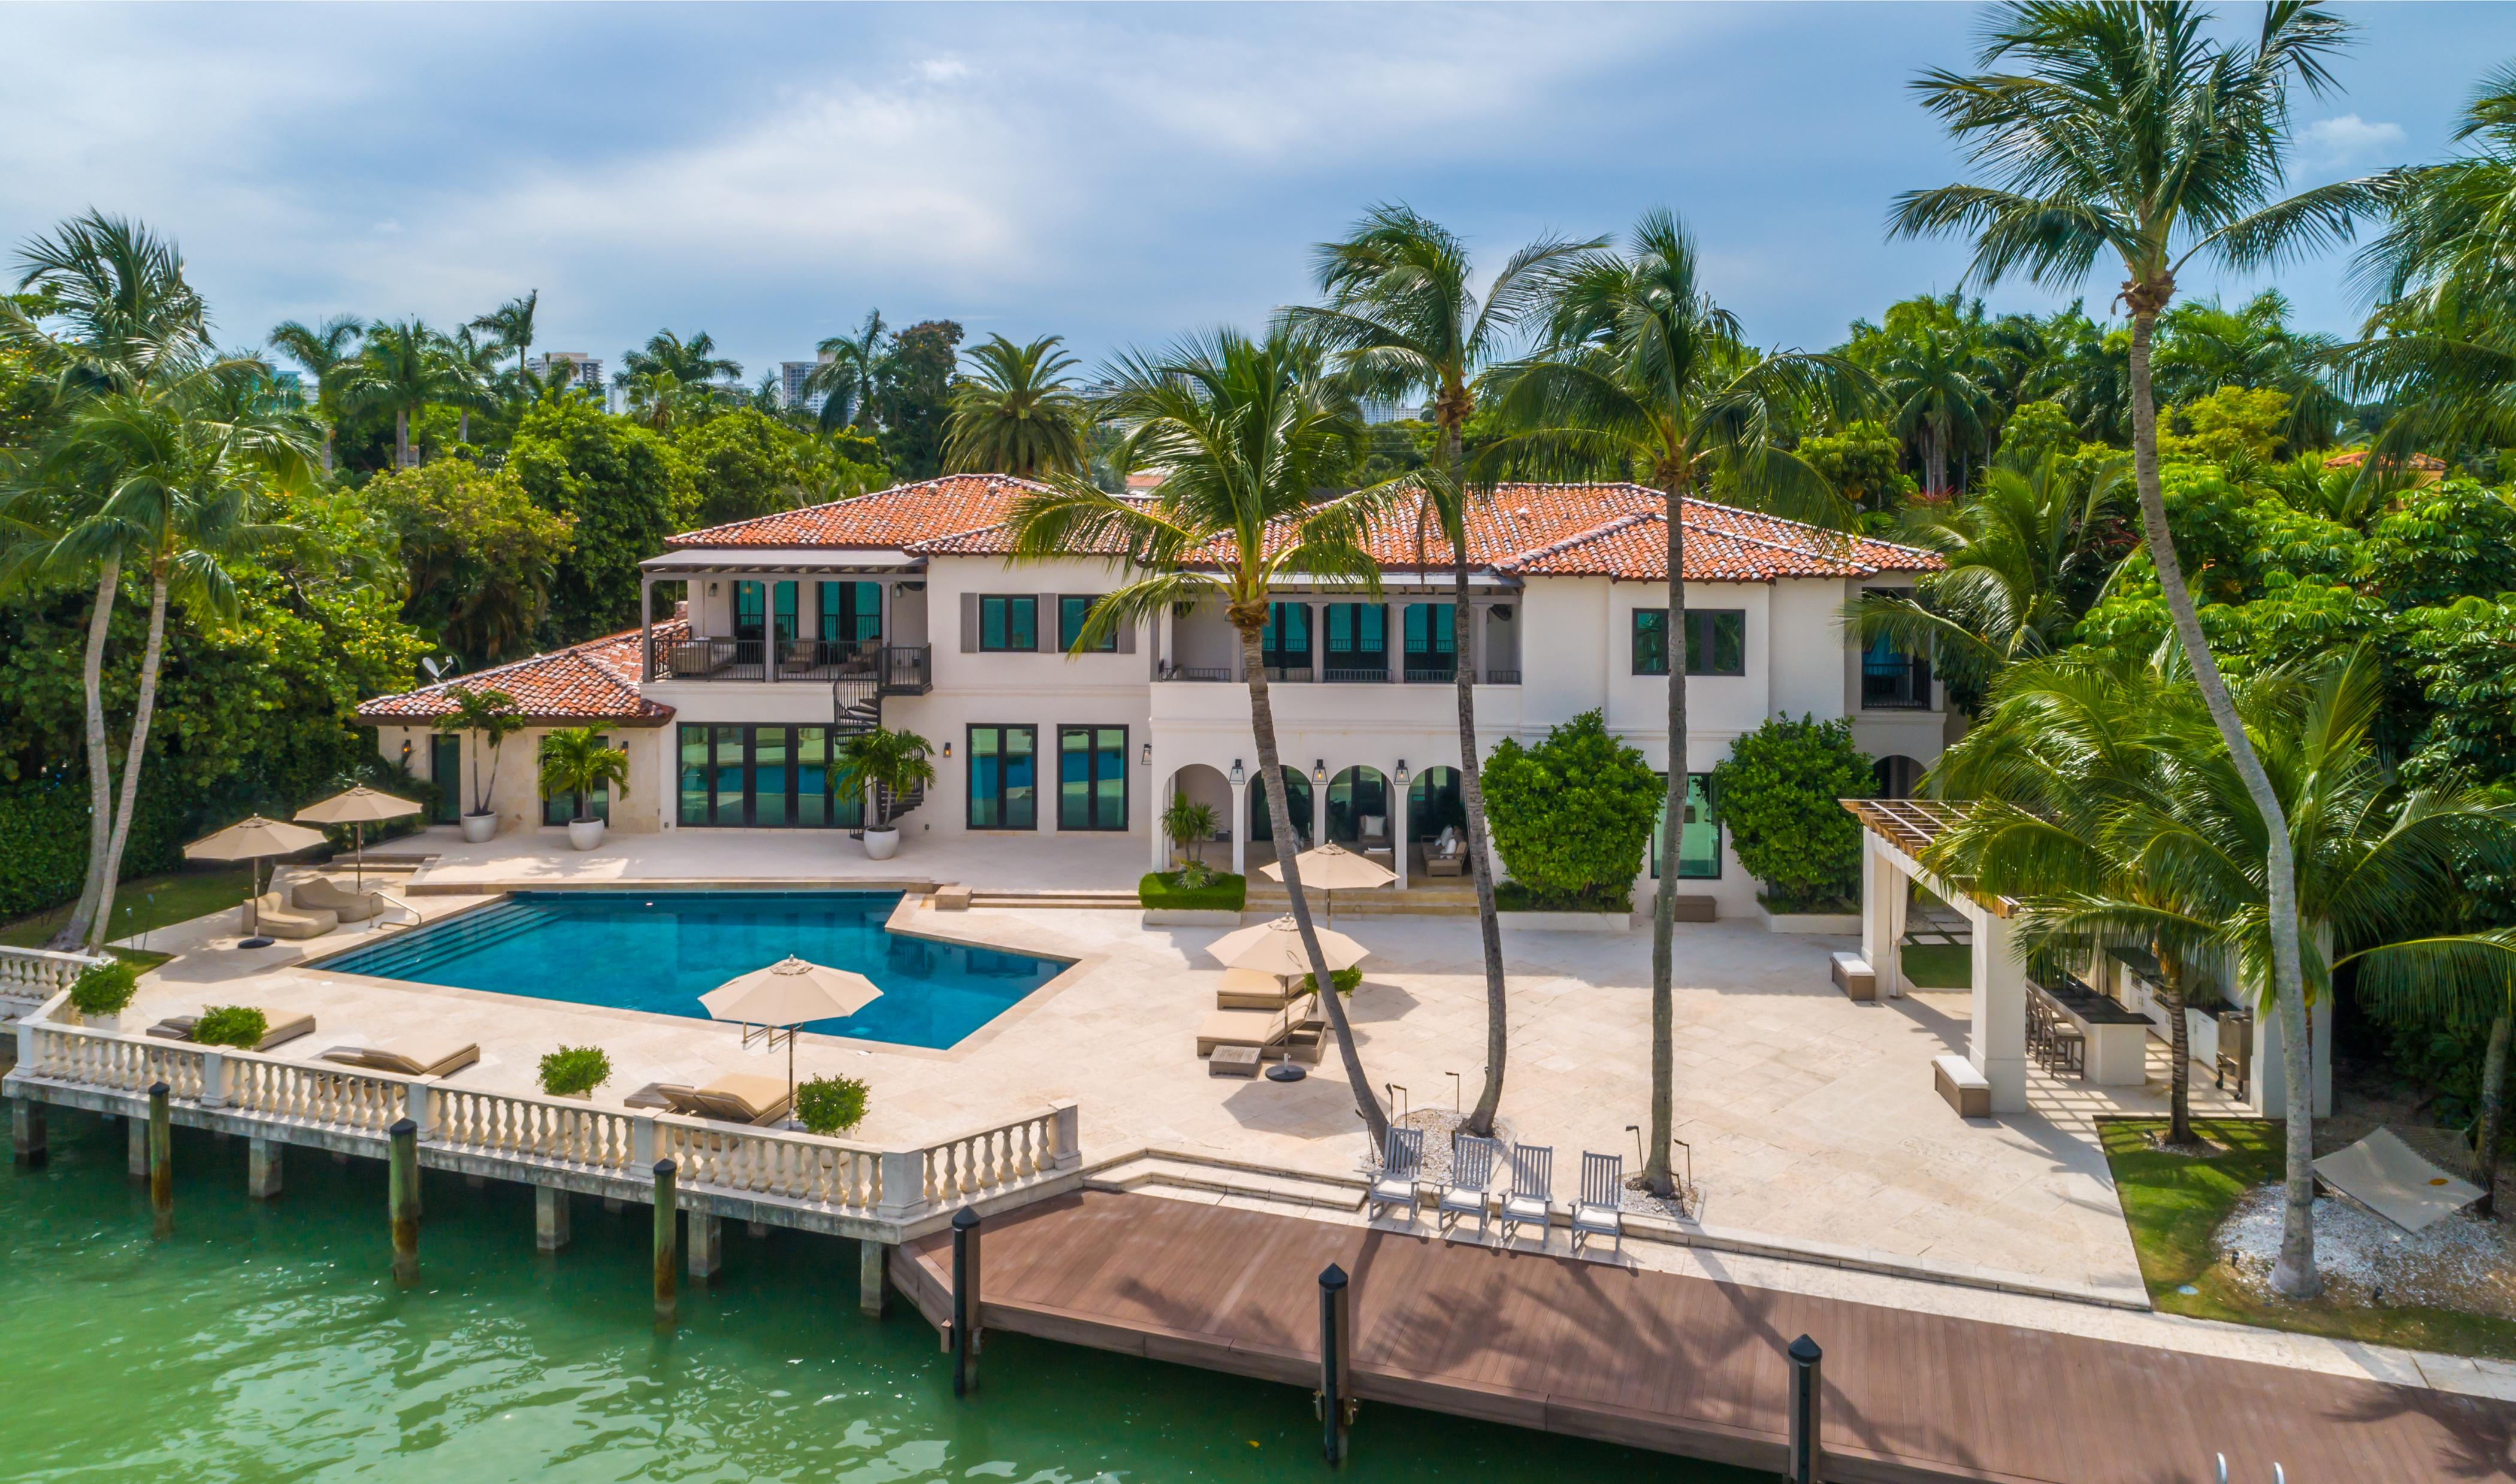 Dwyane Wade's Miami Beach mansion seeks $32.5 million photo